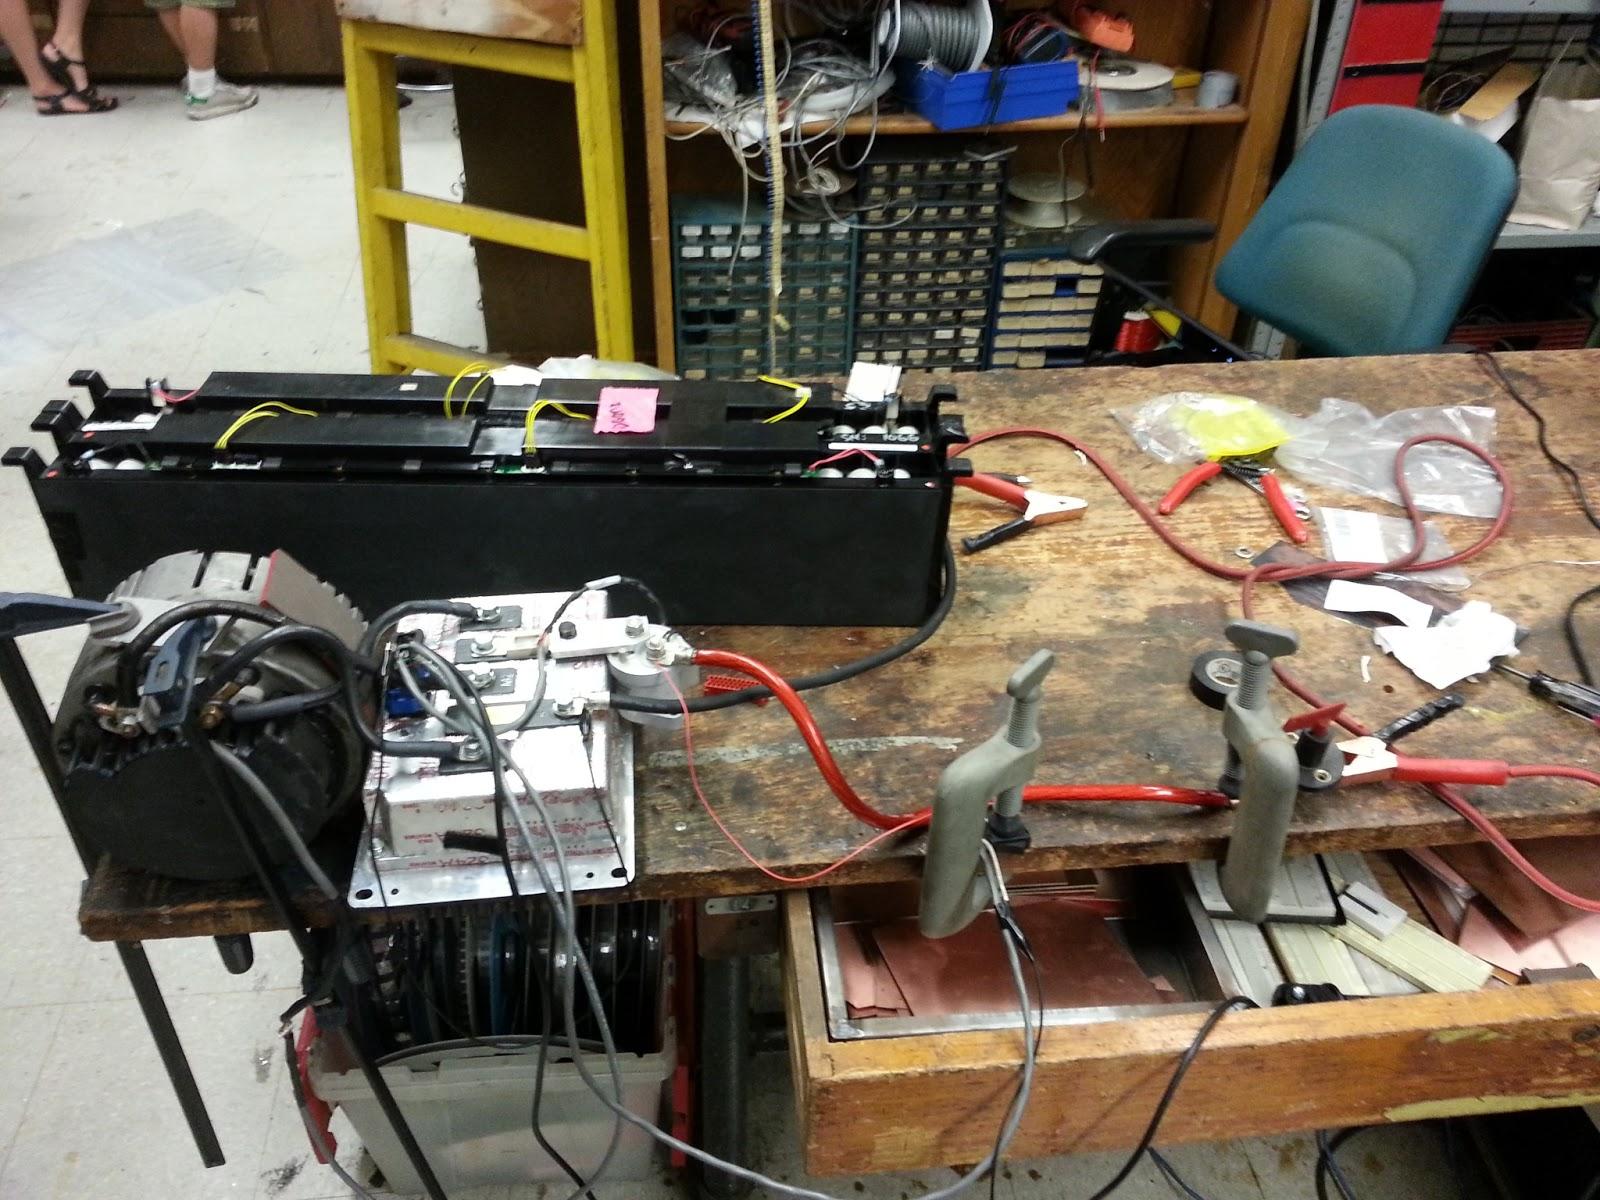 ez go golf cart starter generator wiring diagram images ez go gas wiring diagram ez go marathon gas wiring diagram 97 ez go